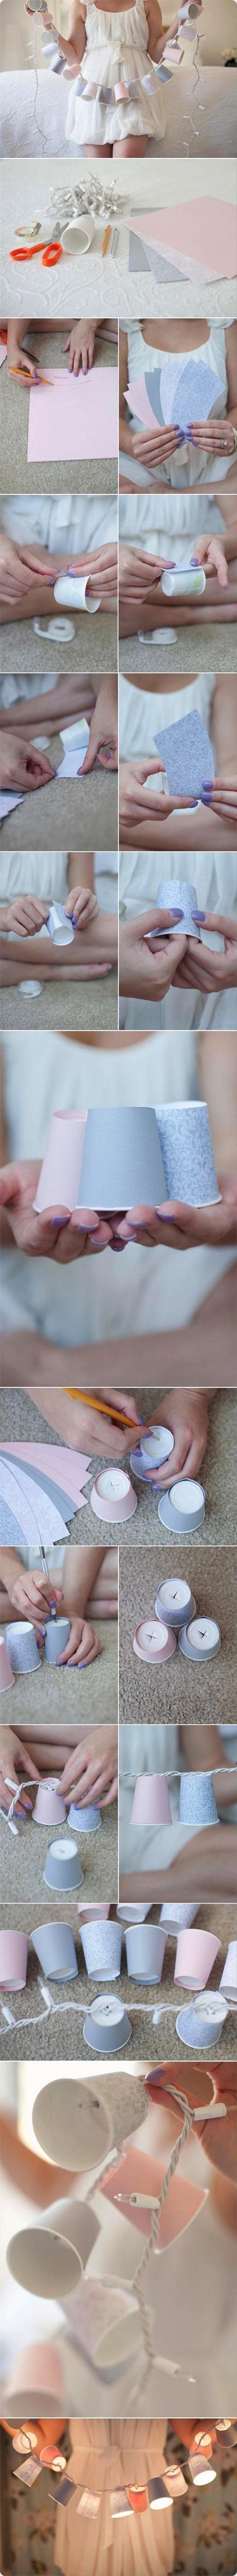 craft-ideas-10